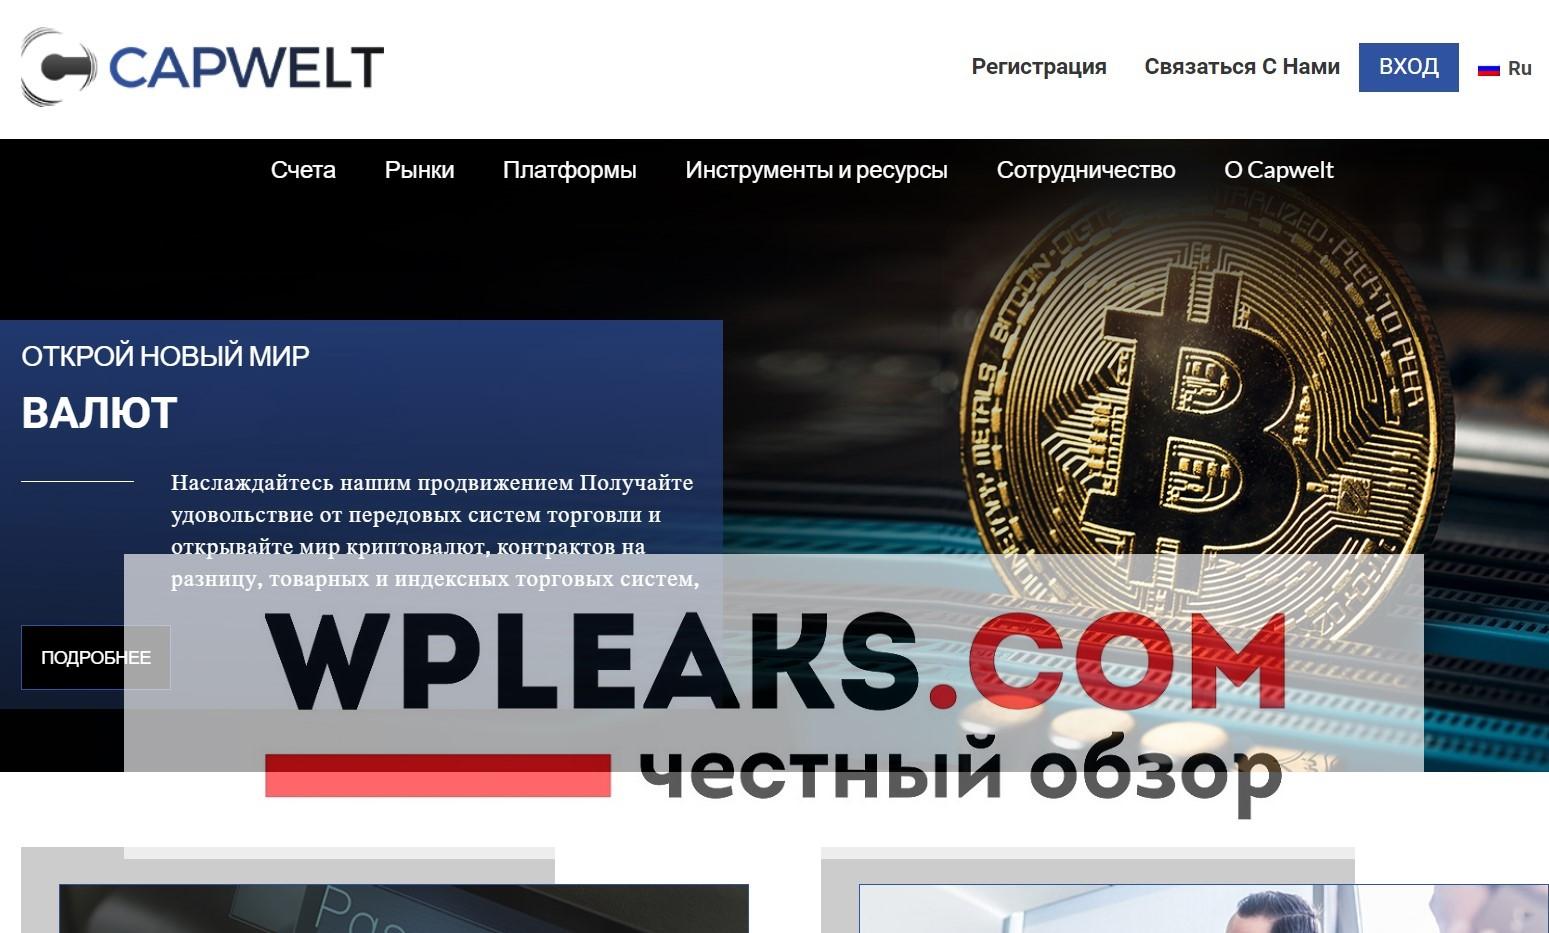 capwelt.com отзывы